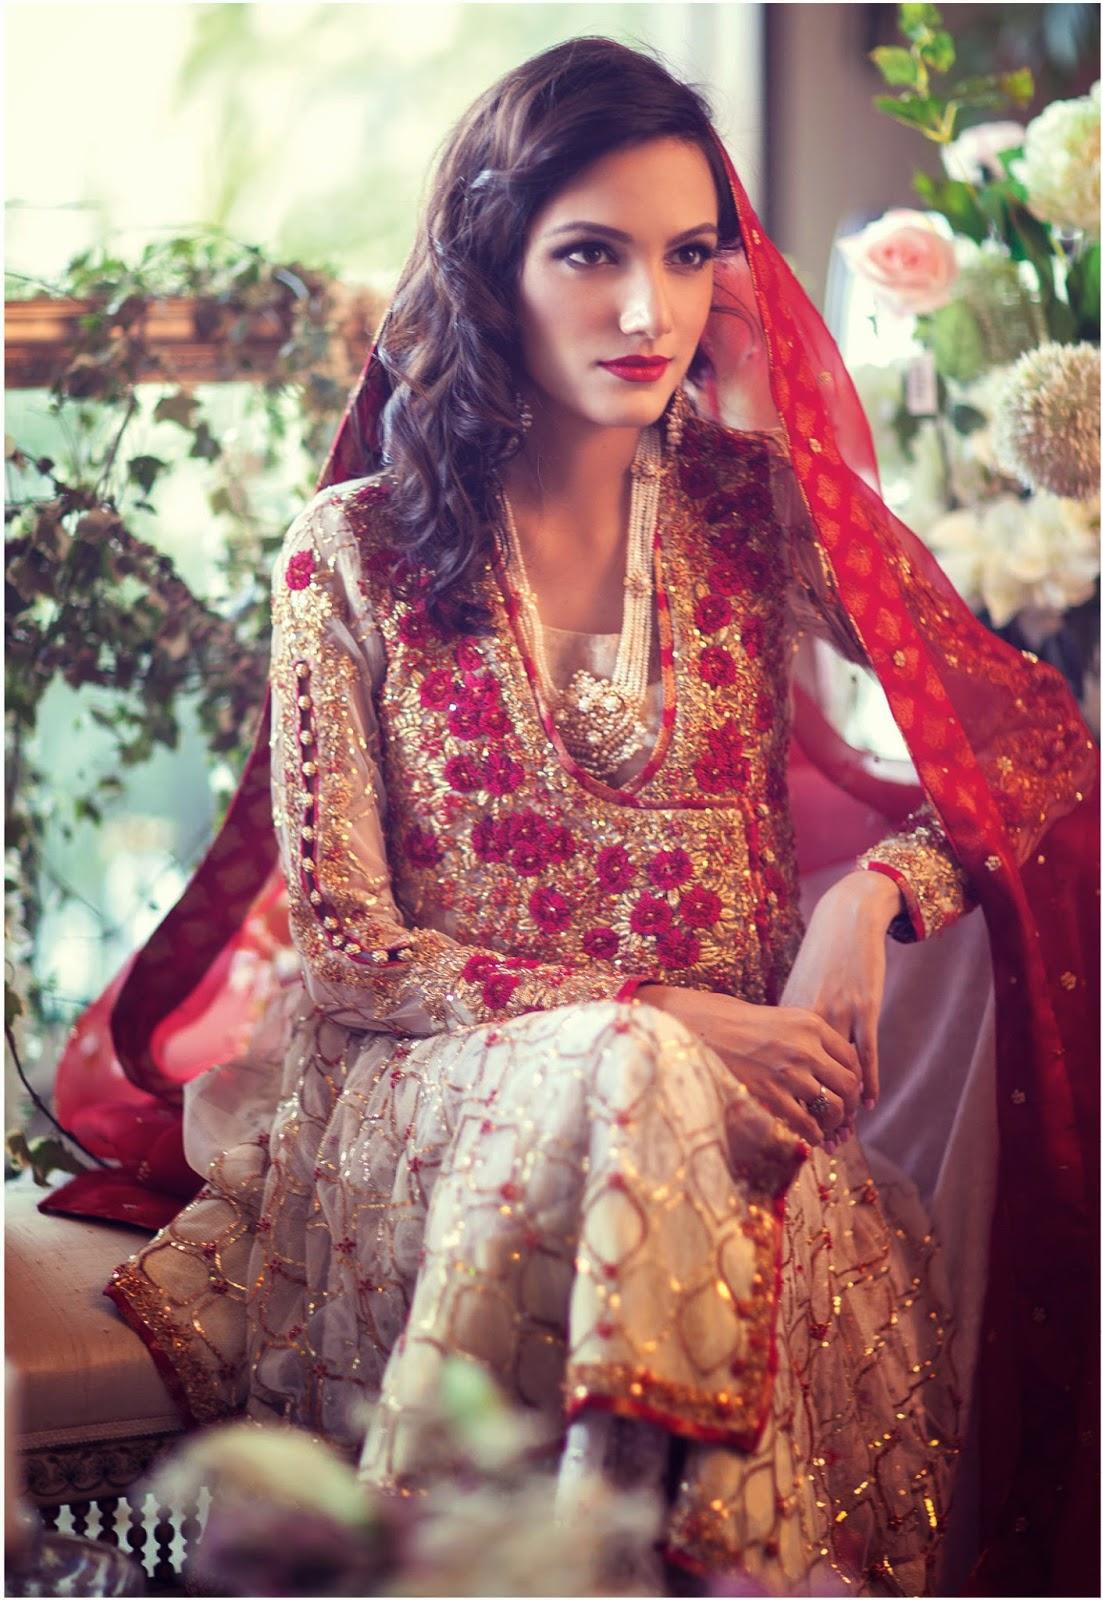 Farah Talib Aziz Ss 15 Campaign Featuring Meera Ansari And